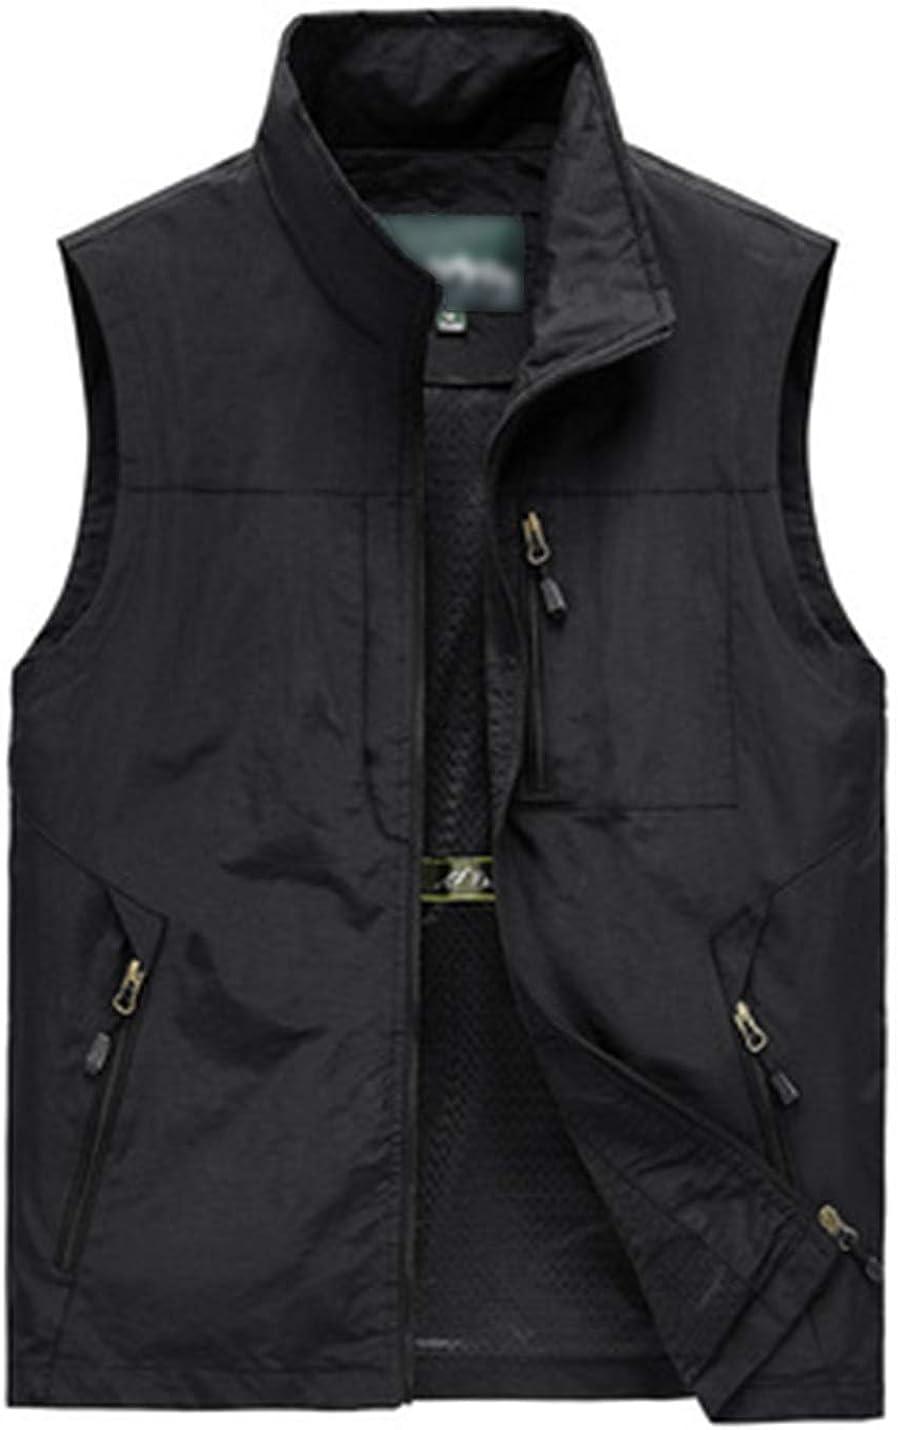 PEHMEA Men's Outdoor Work Safari Fishing Travel Photography Vest with Pockets